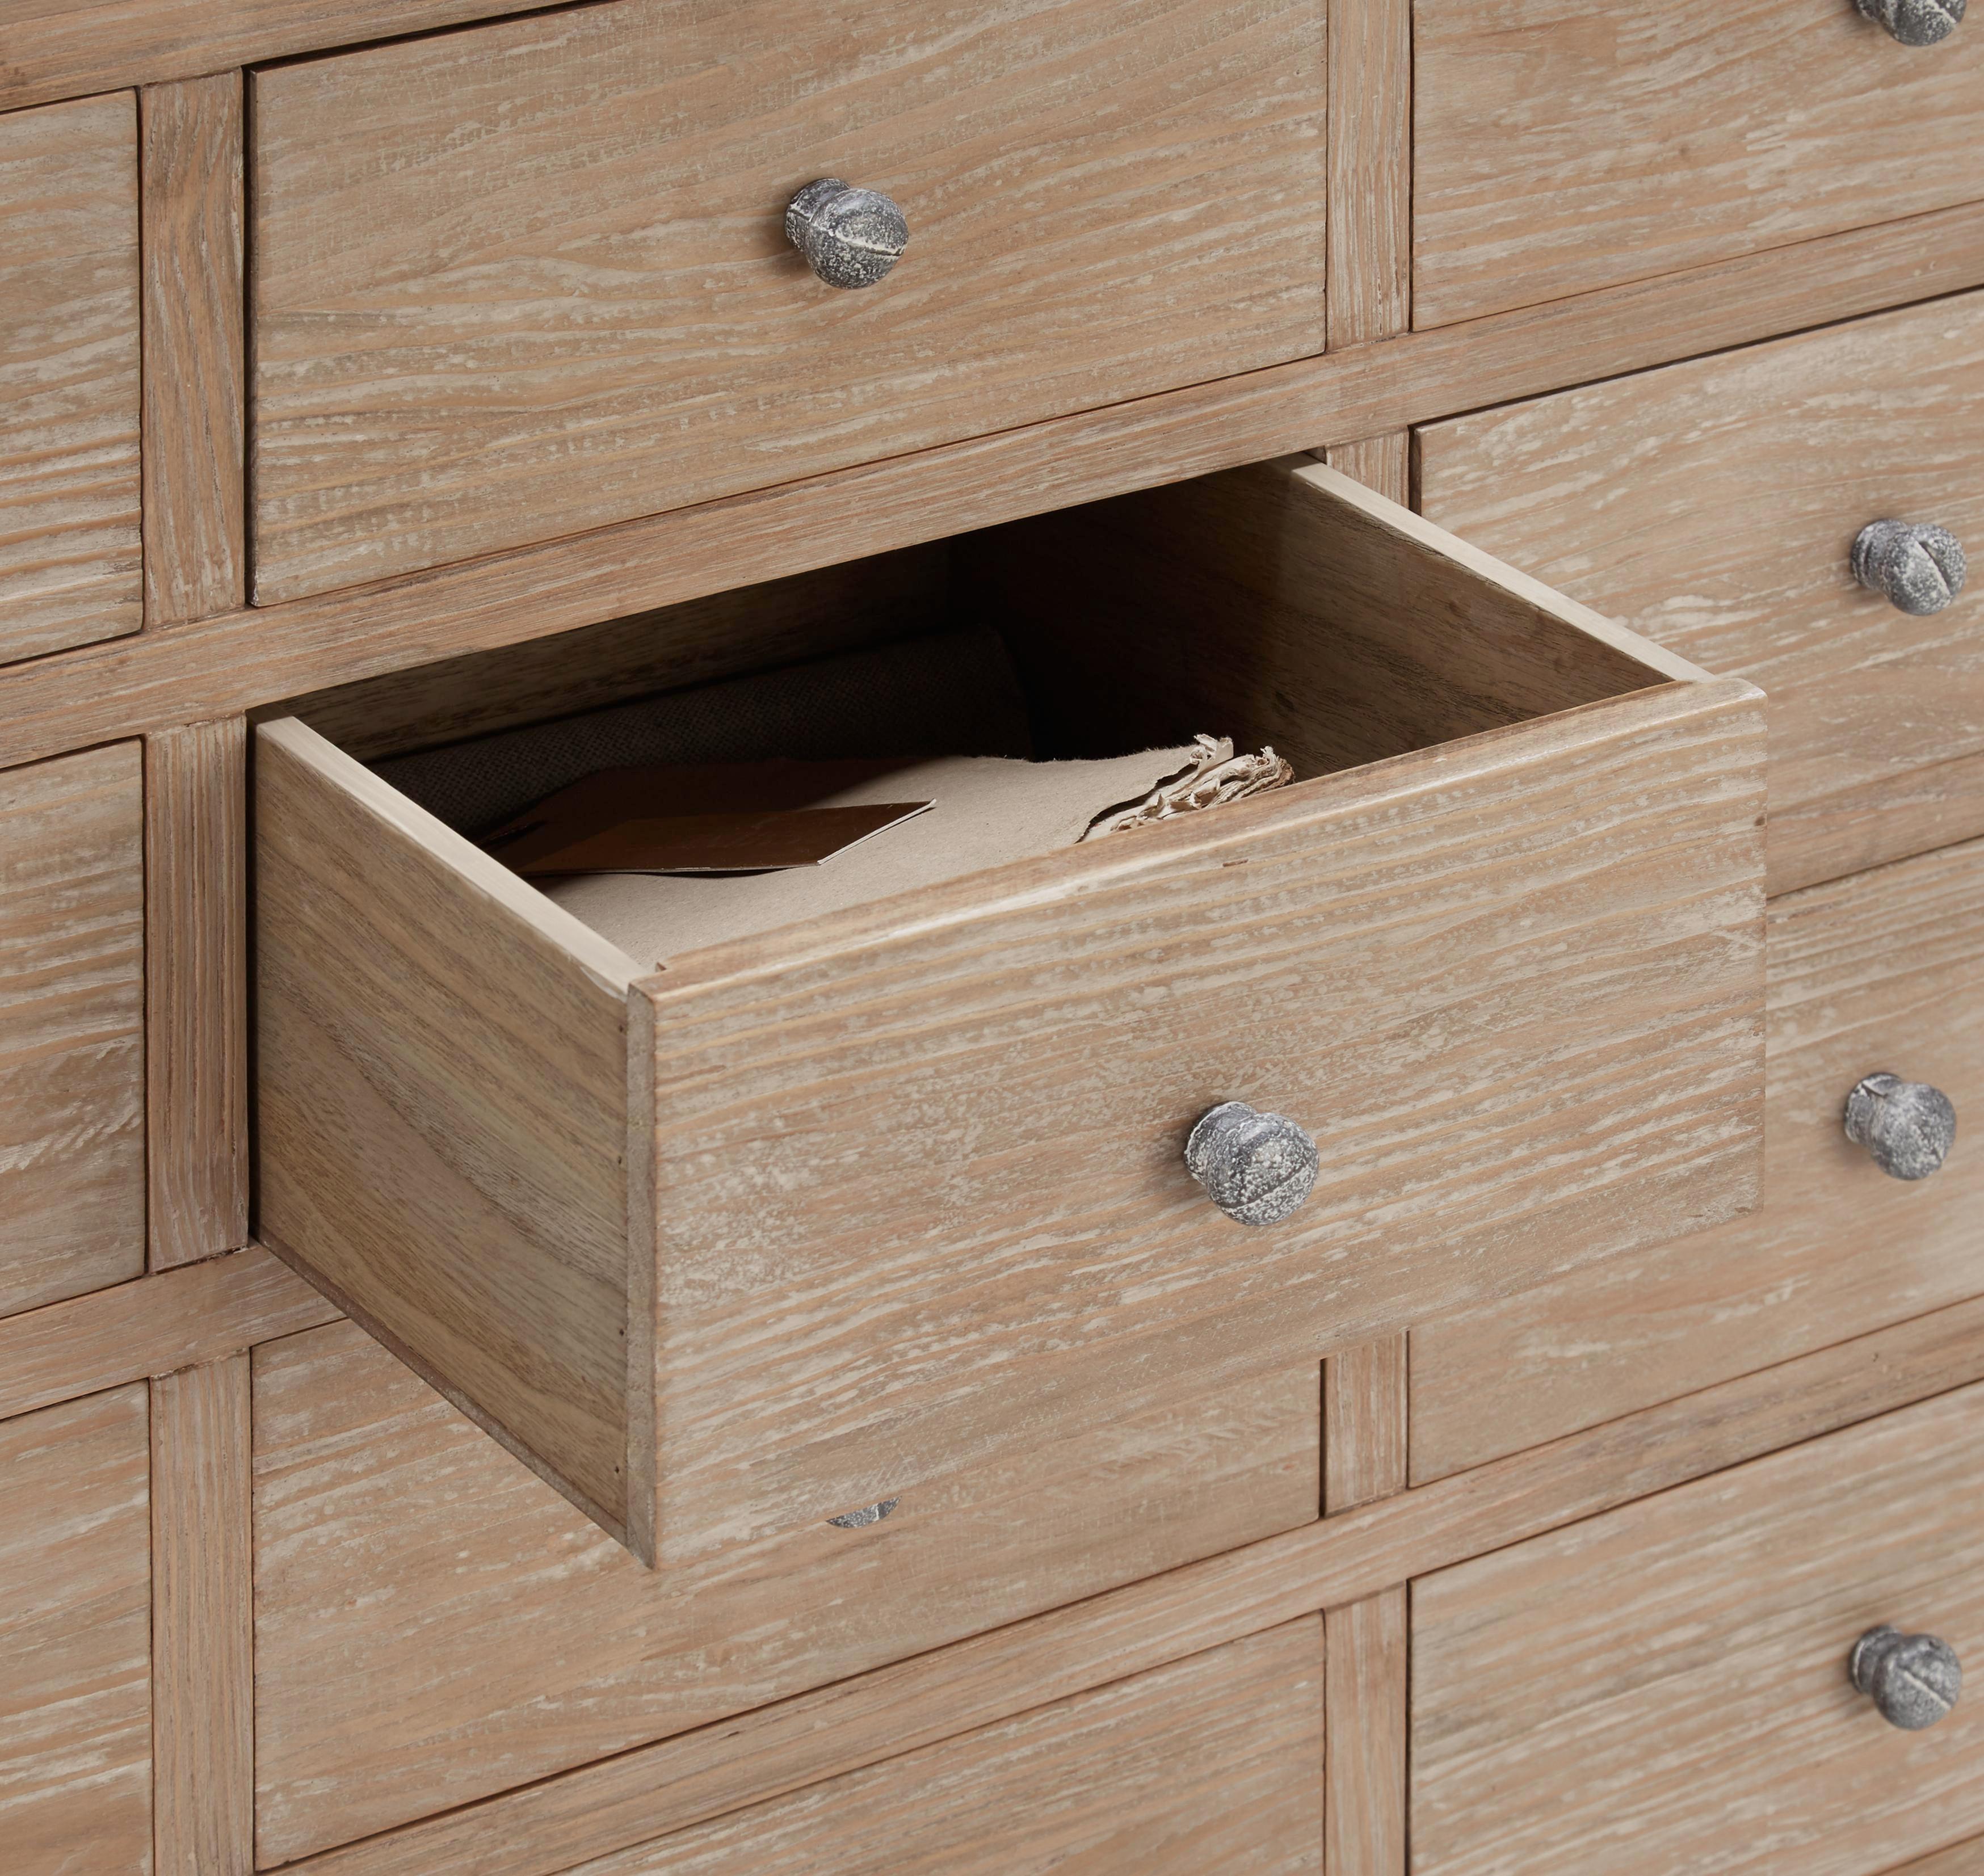 Sideboard Savannah - Kieferfarben, MODERN, Holz/Metall (140,5/82,5/40cm) - MÖMAX modern living